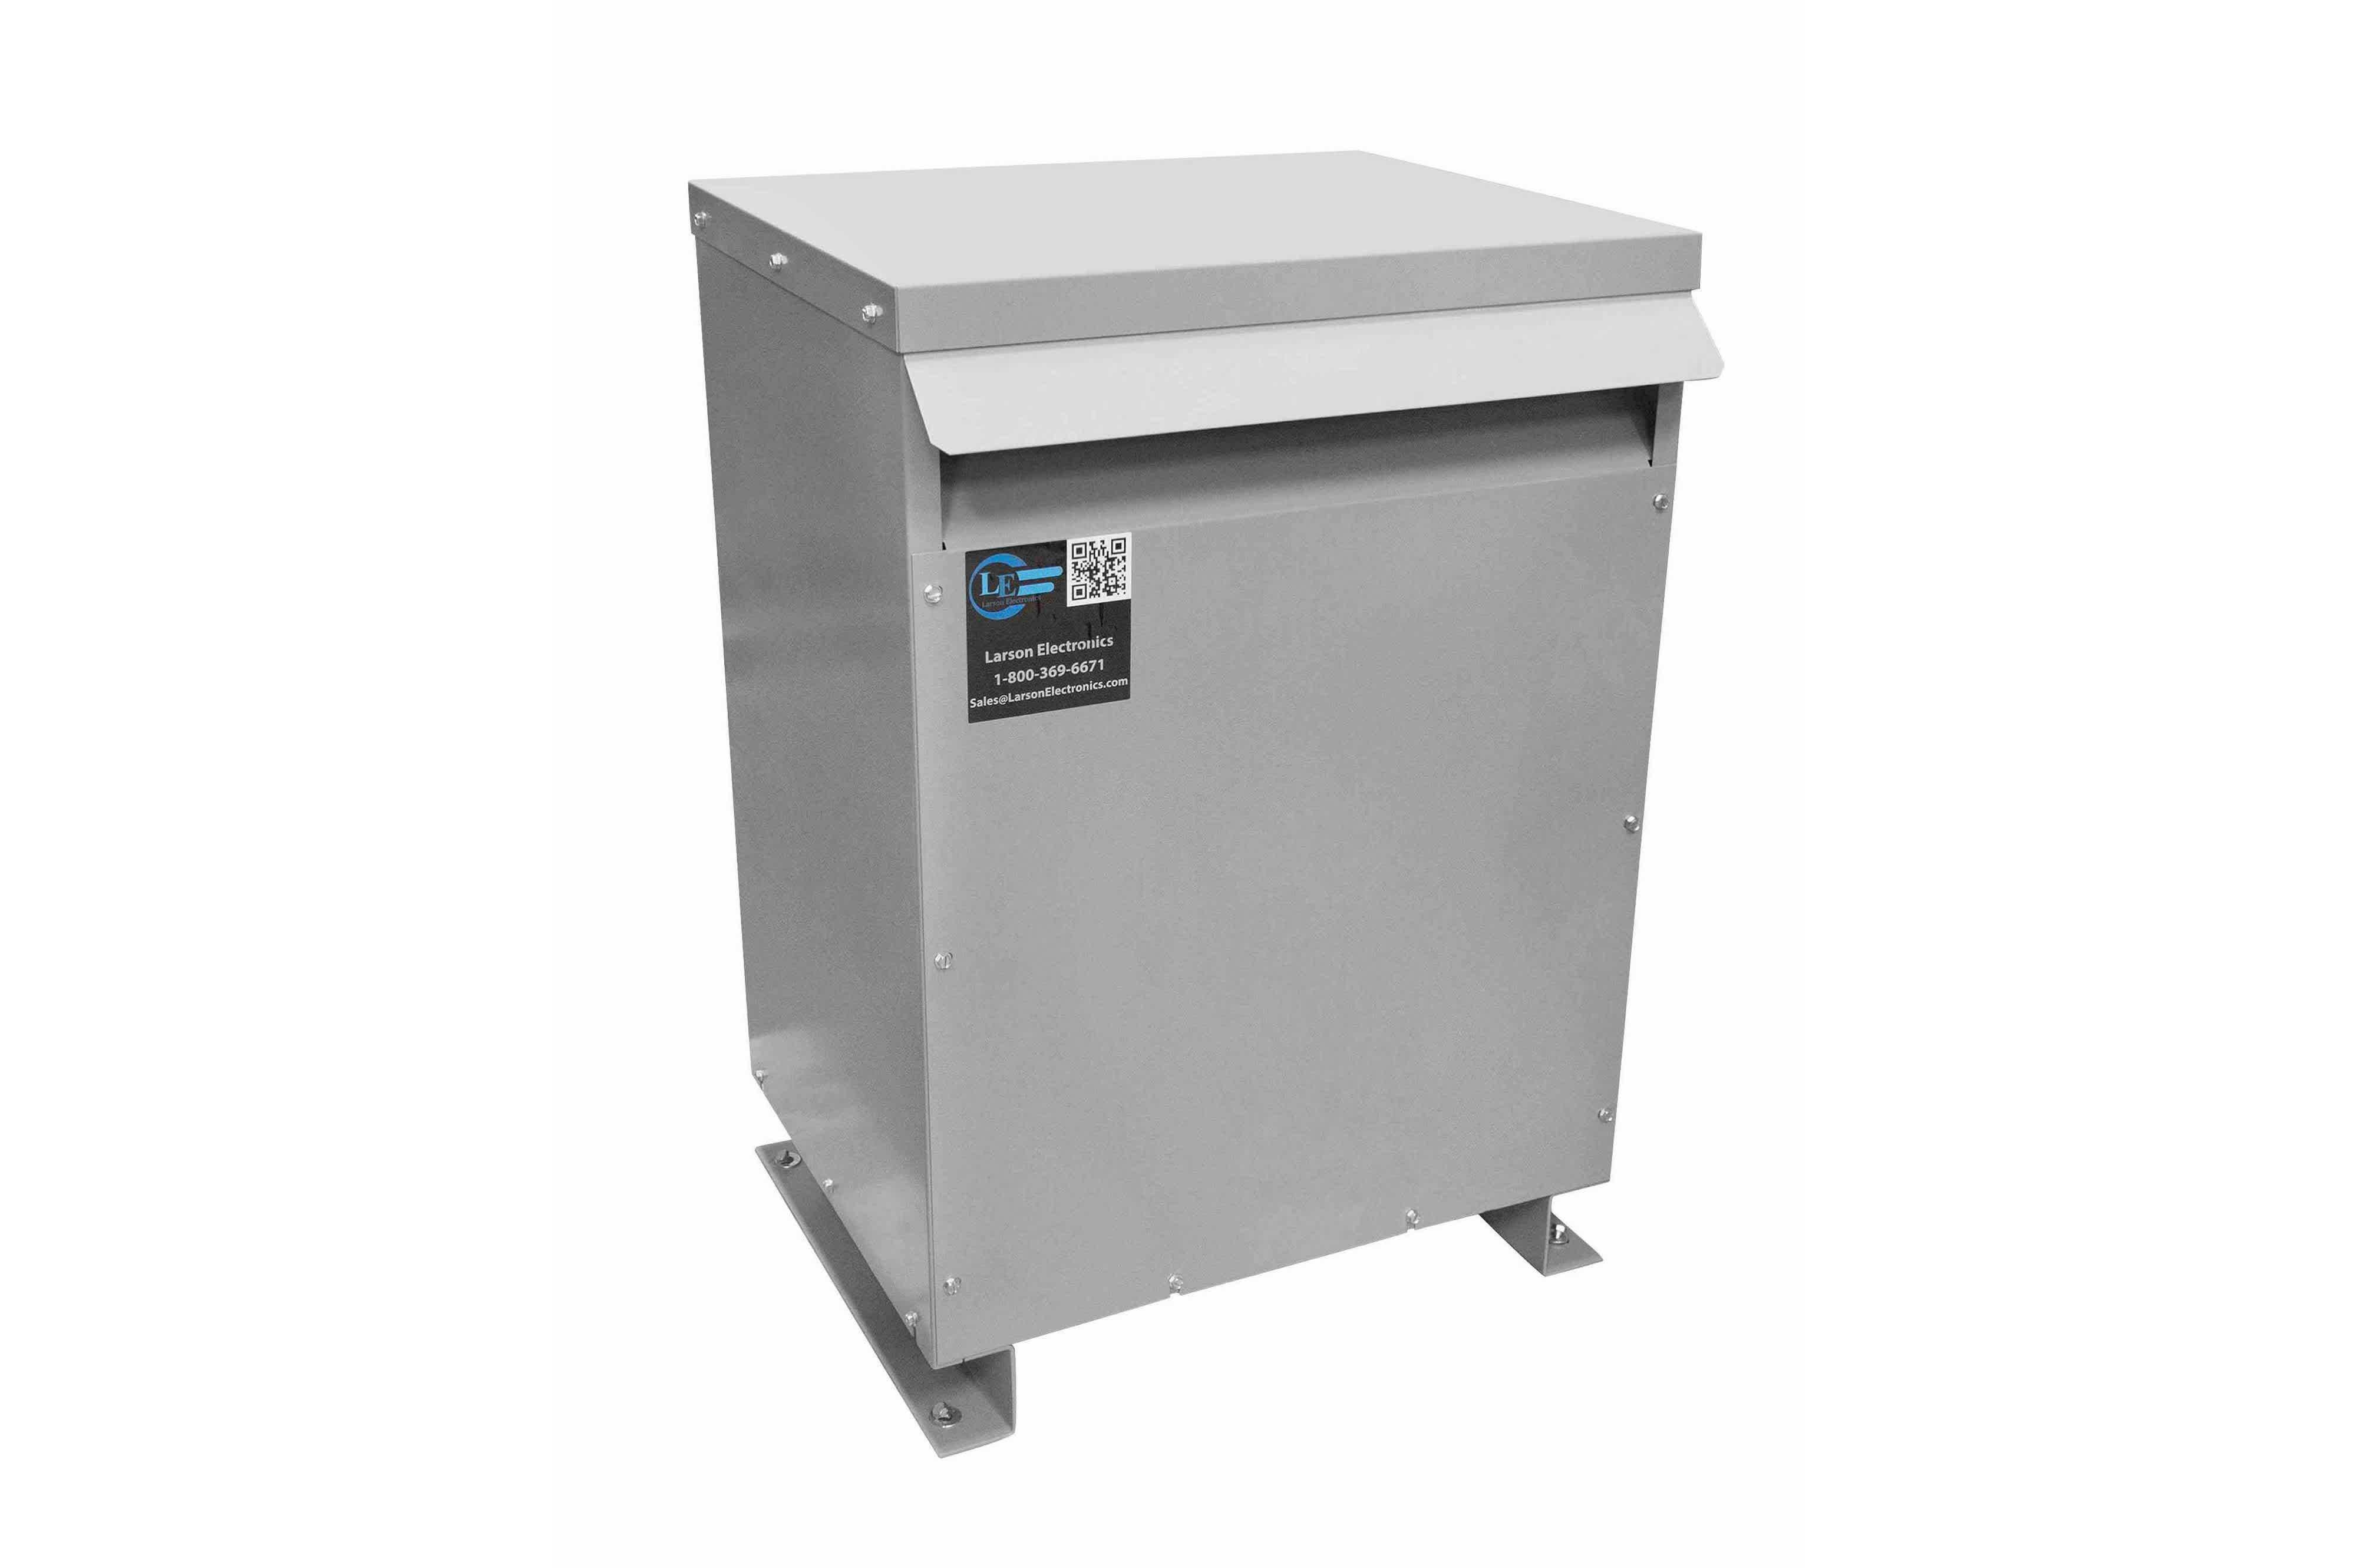 12 kVA 3PH Isolation Transformer, 600V Wye Primary, 400Y/231 Wye-N Secondary, N3R, Ventilated, 60 Hz